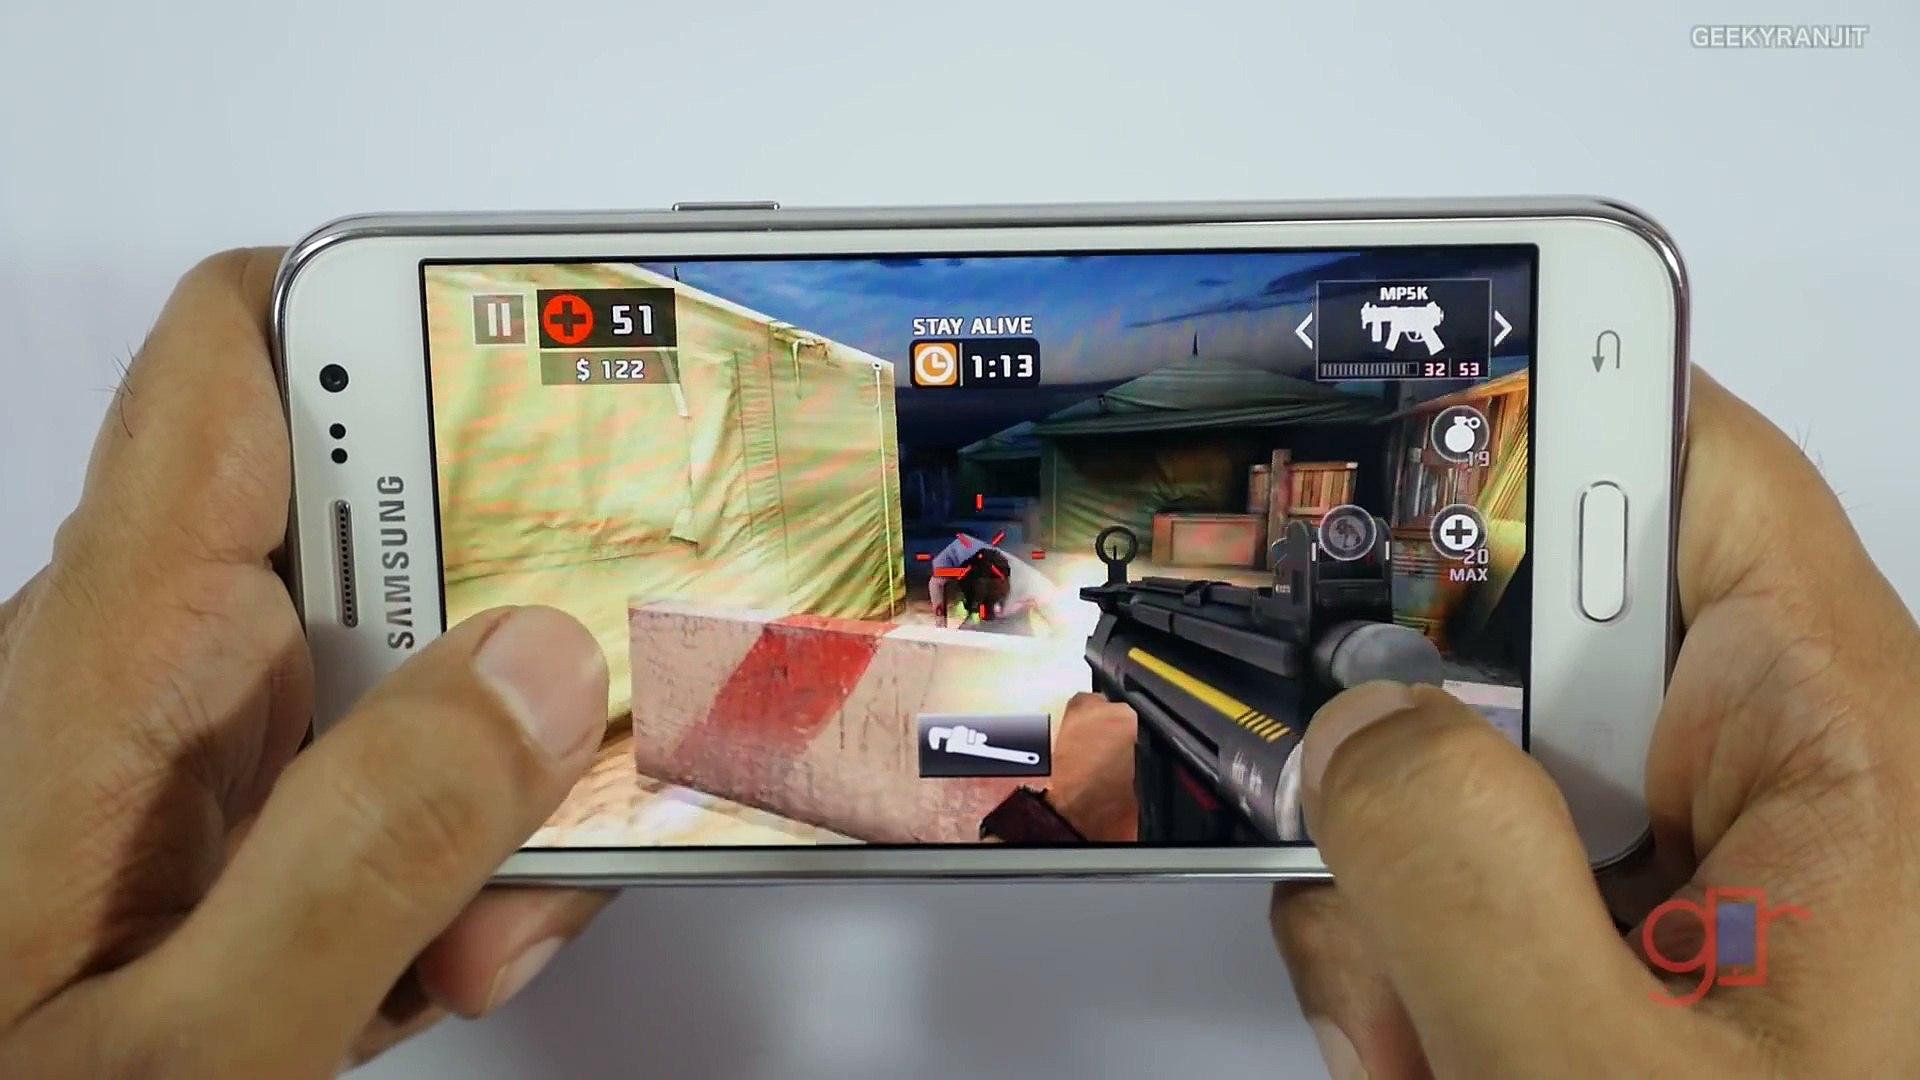 Samsung Galaxy J5 Gaming Review - A Gaming Smartphone